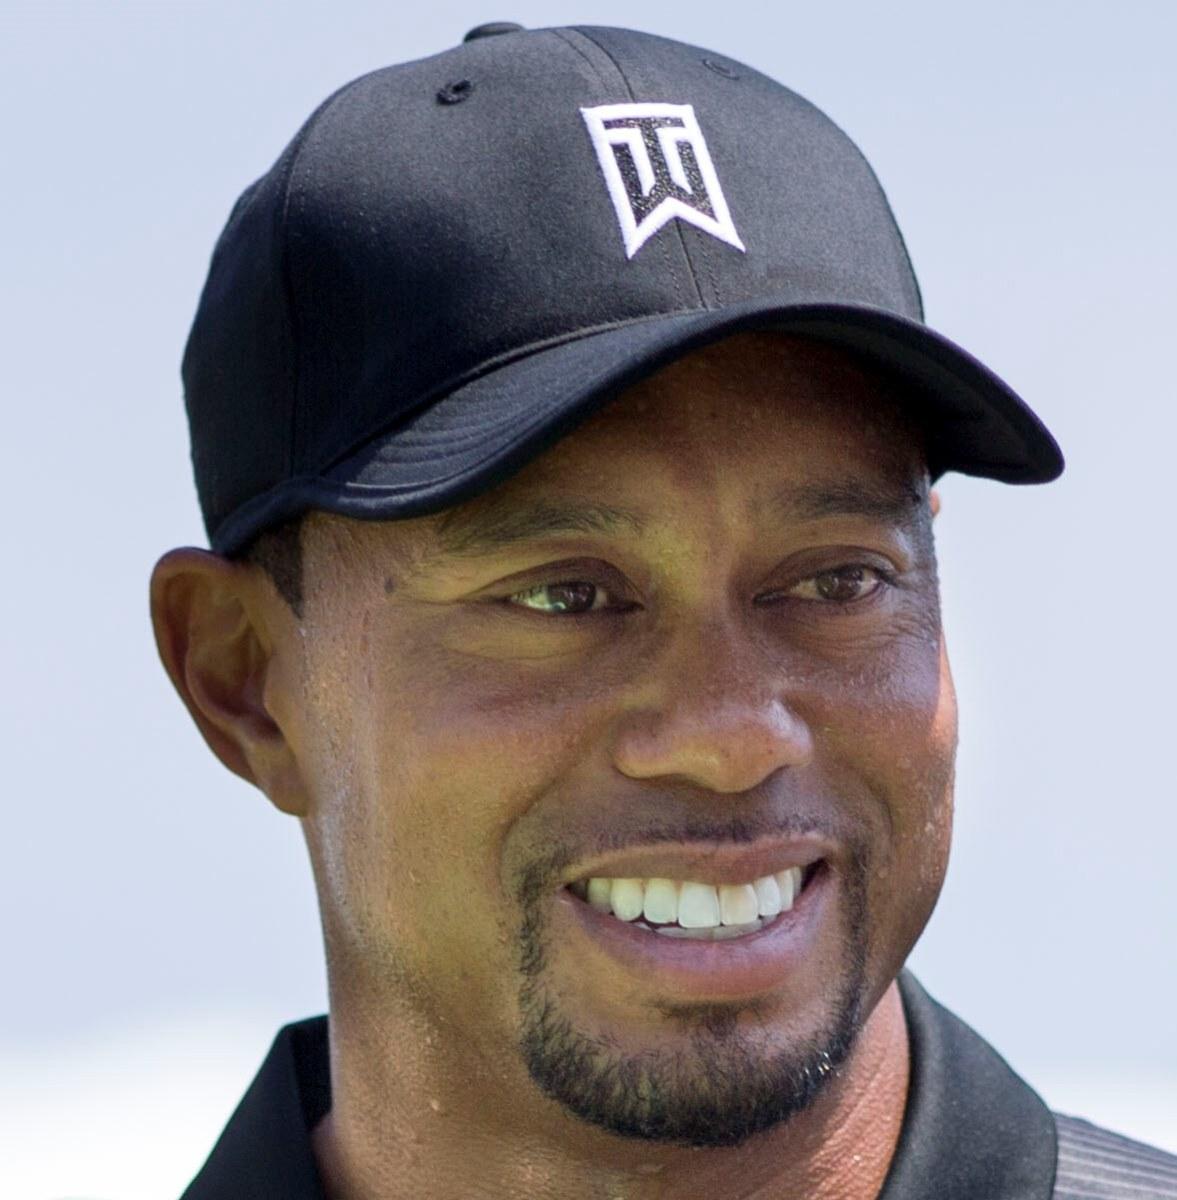 Tiger Woods: born December 30th 1975